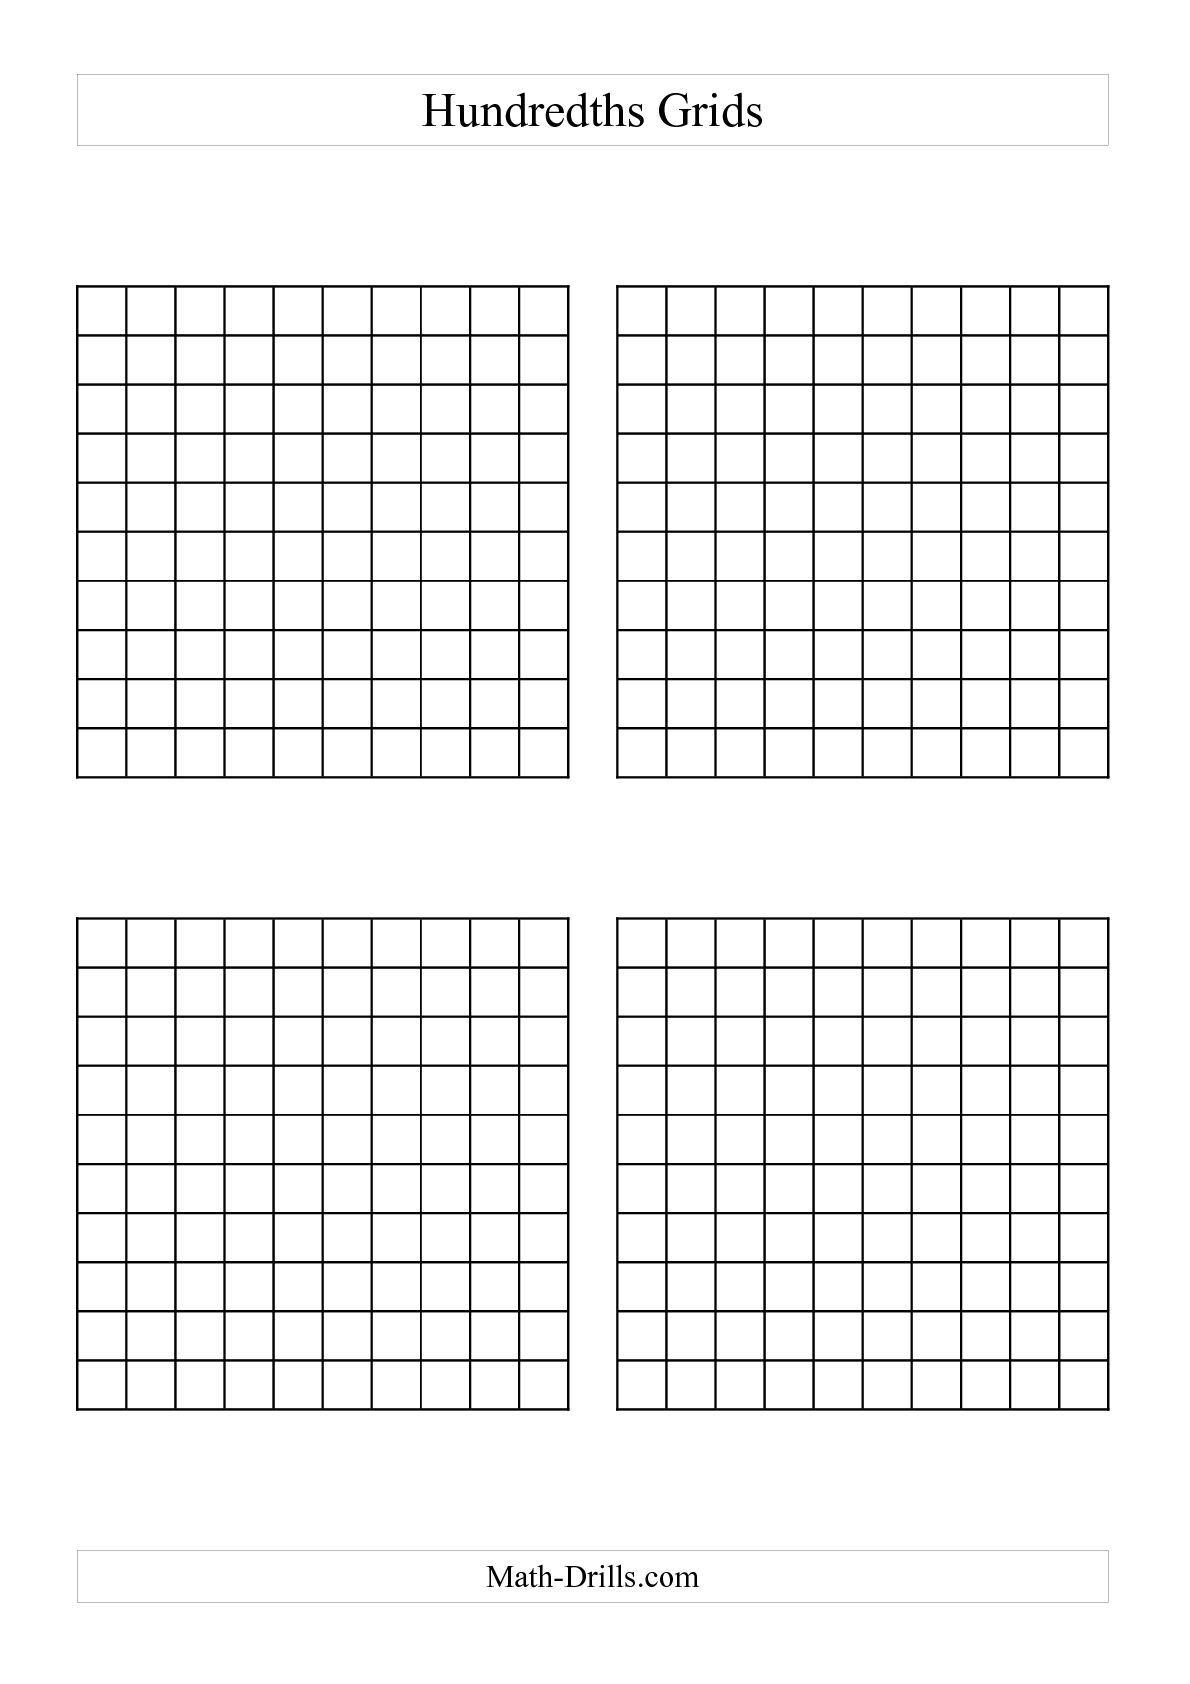 10 By 10 Grids To Add Decimals